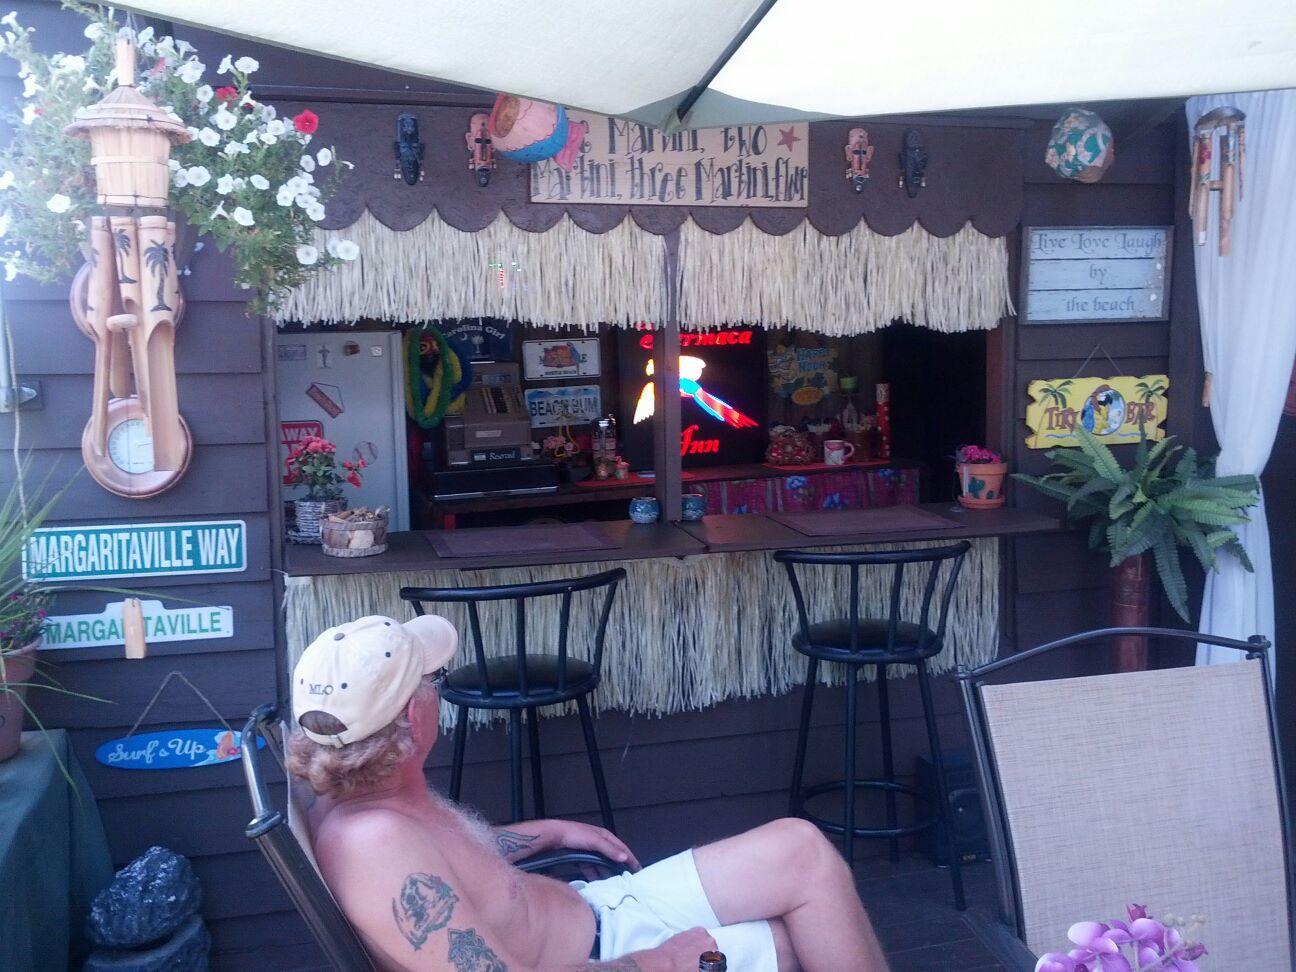 Backyard Tiki Bar Ideas : Our homemade backyard tiki bar  Tiki bar patio ideas  Pinterest